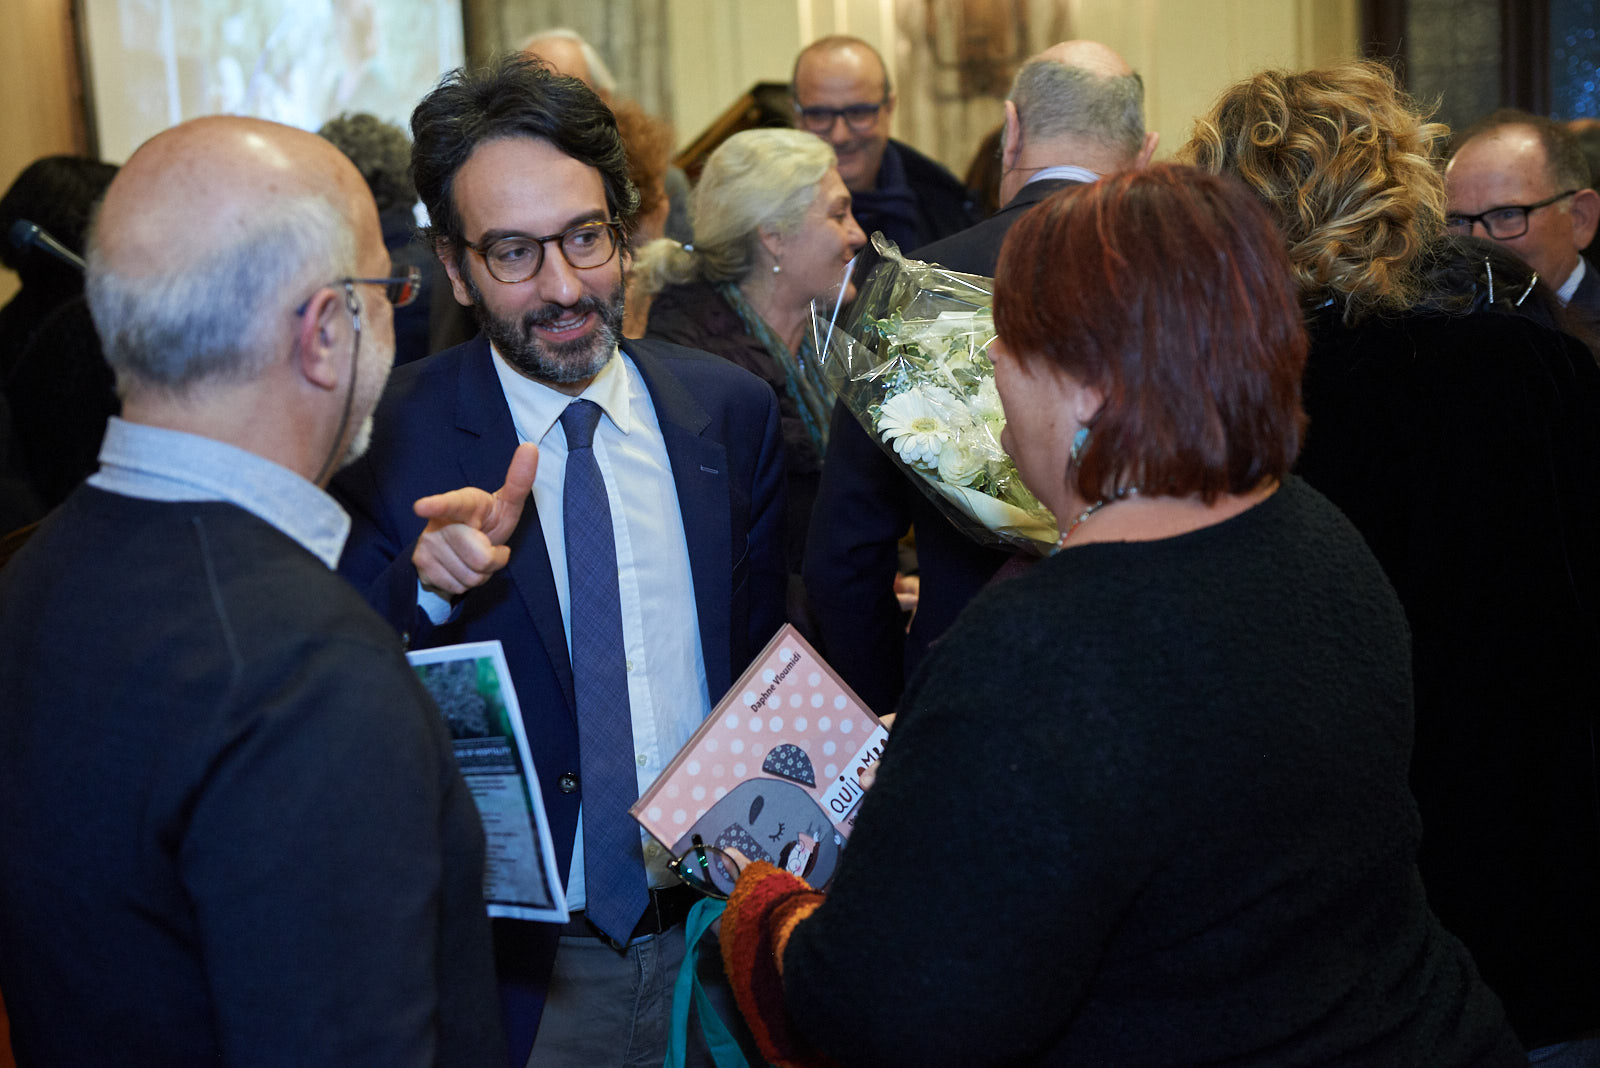 Lamberto Bertolé with Daphne Vloumidi and Iannis Troumpounis